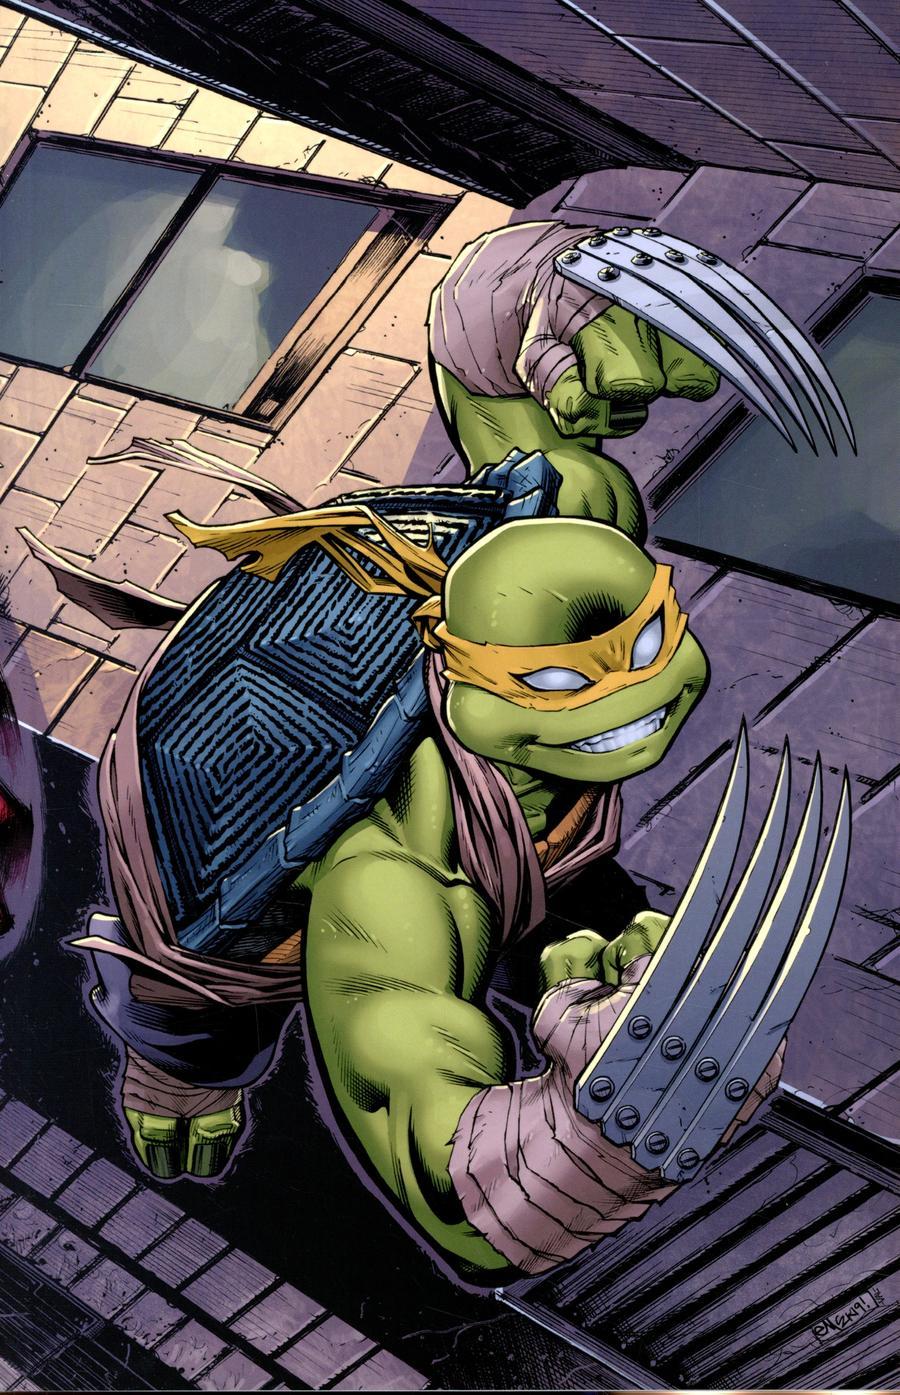 Teenage Mutant Ninja Turtles Vol 5 #100  Midtown Exclusive Cover B Ed McGuinness Wraparound Jennika Virgin Variant Cover